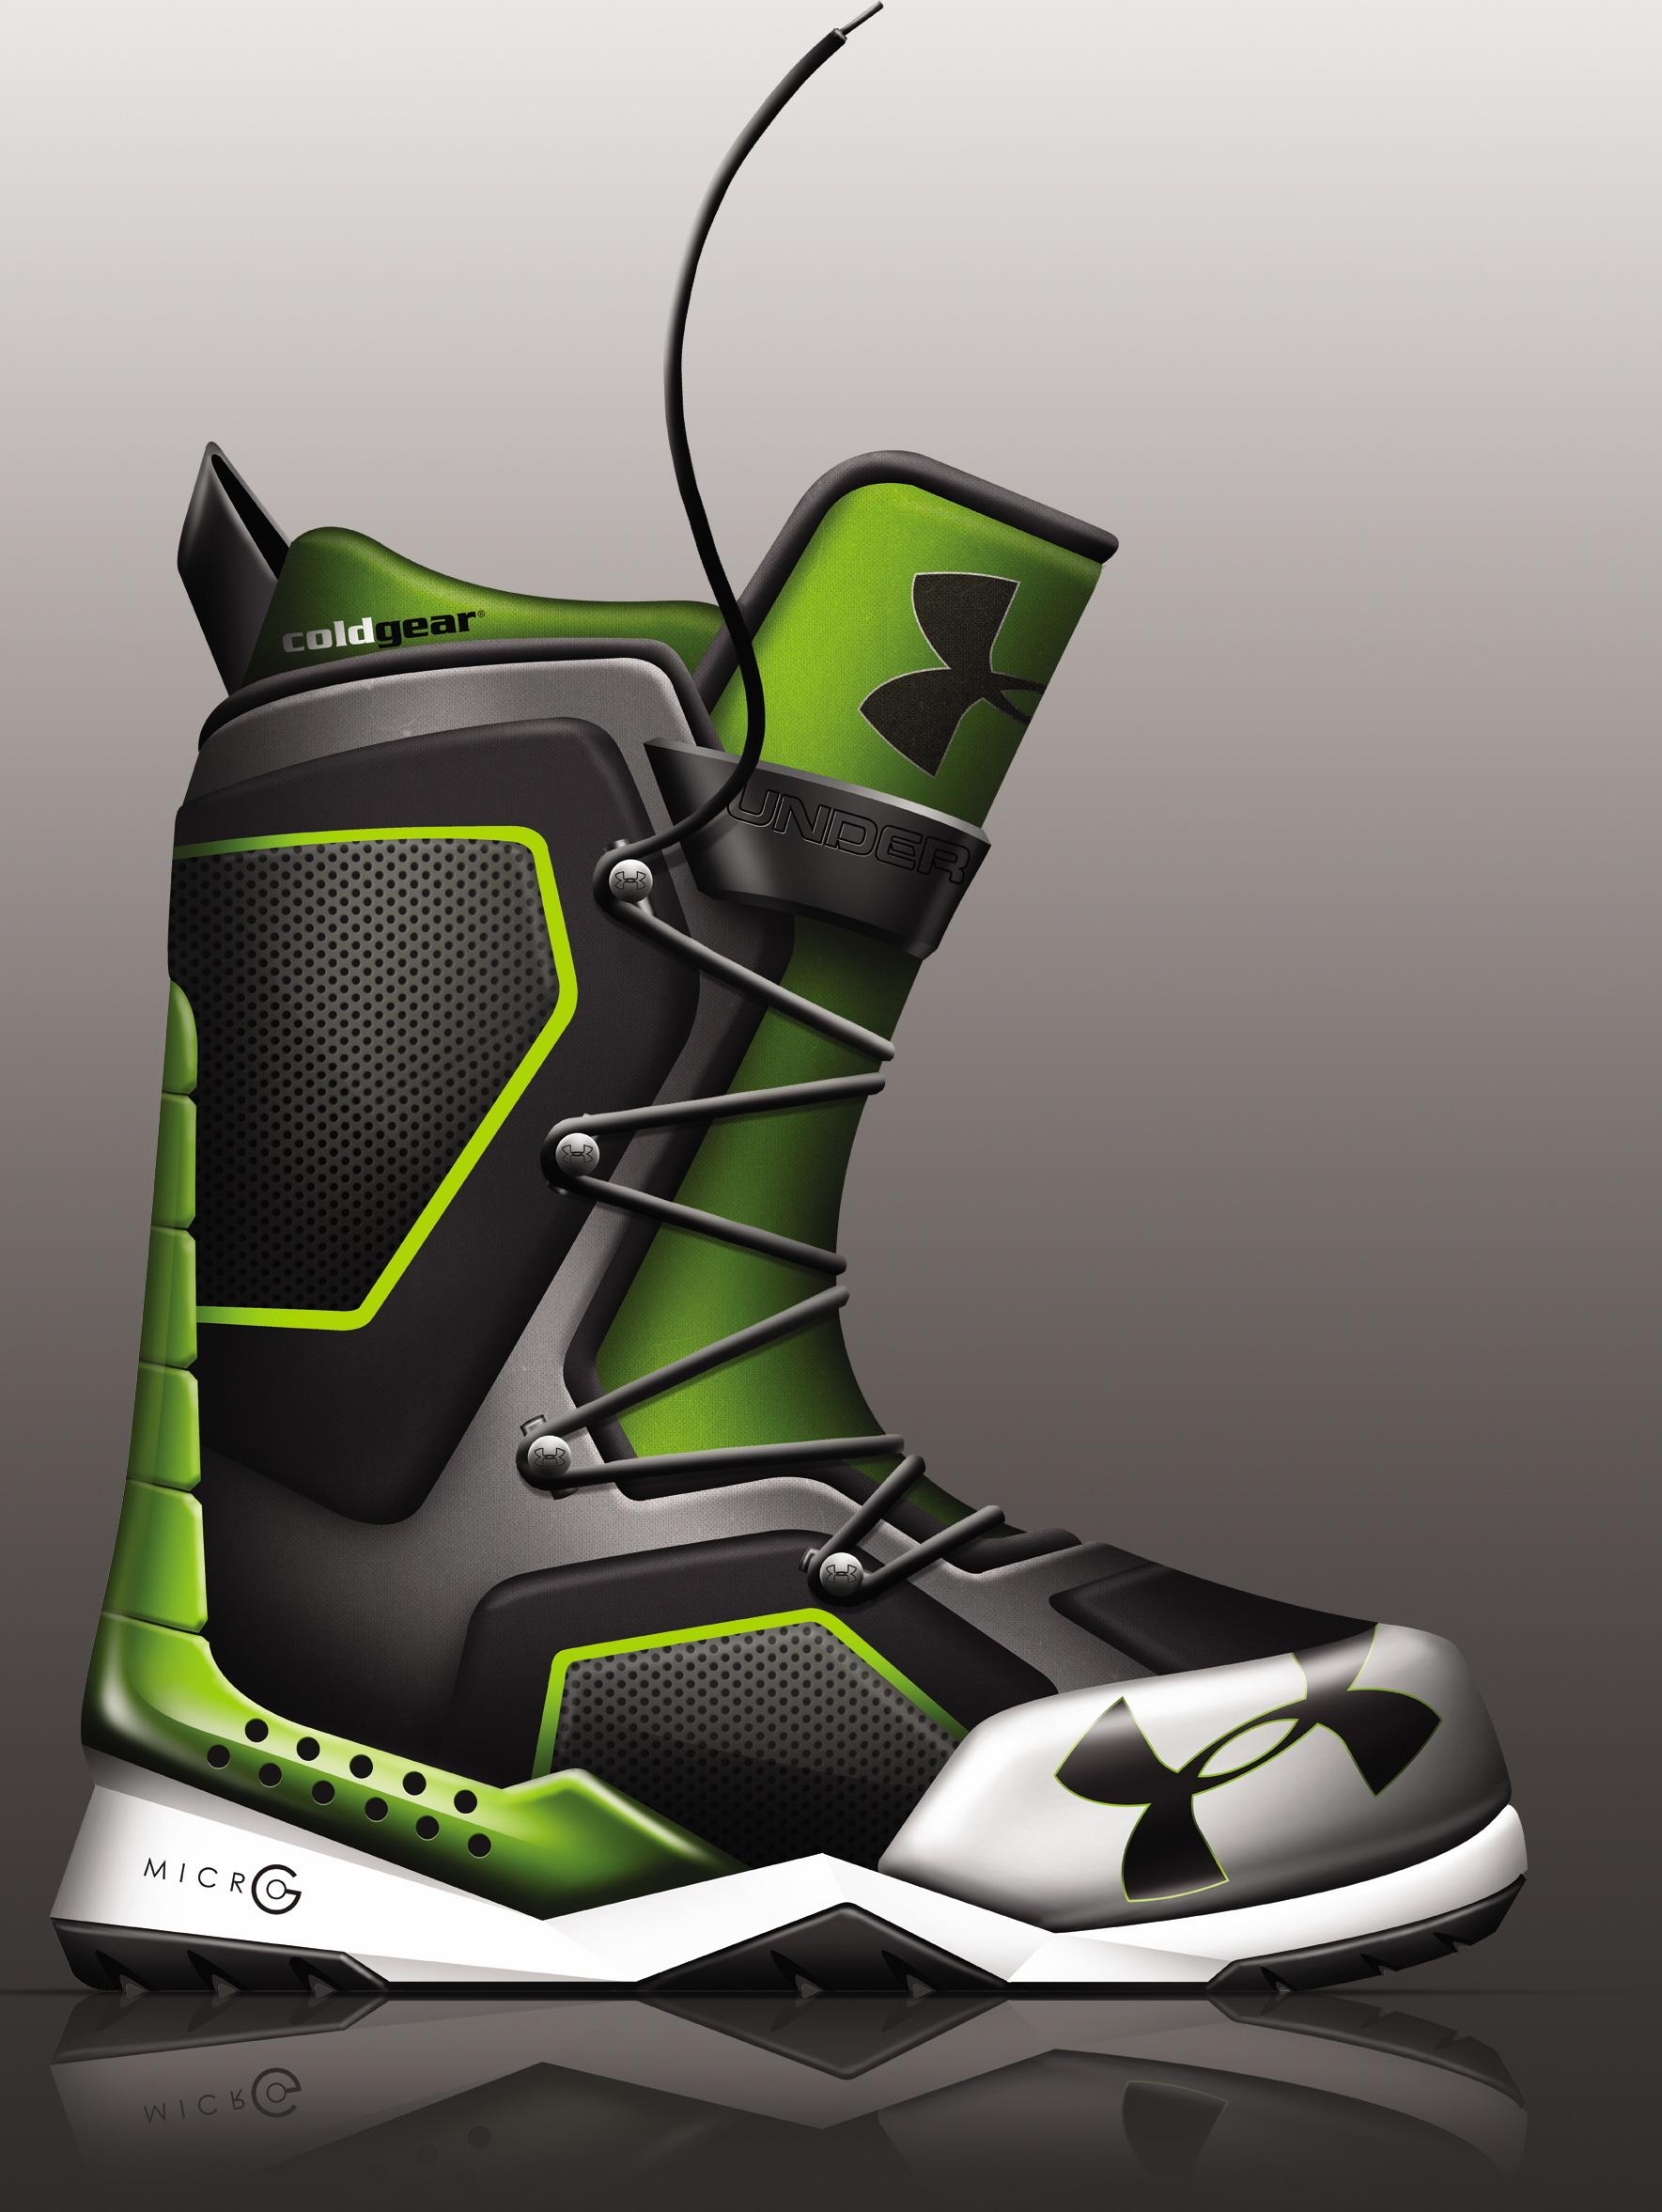 Snowboard Body Armor | eBay